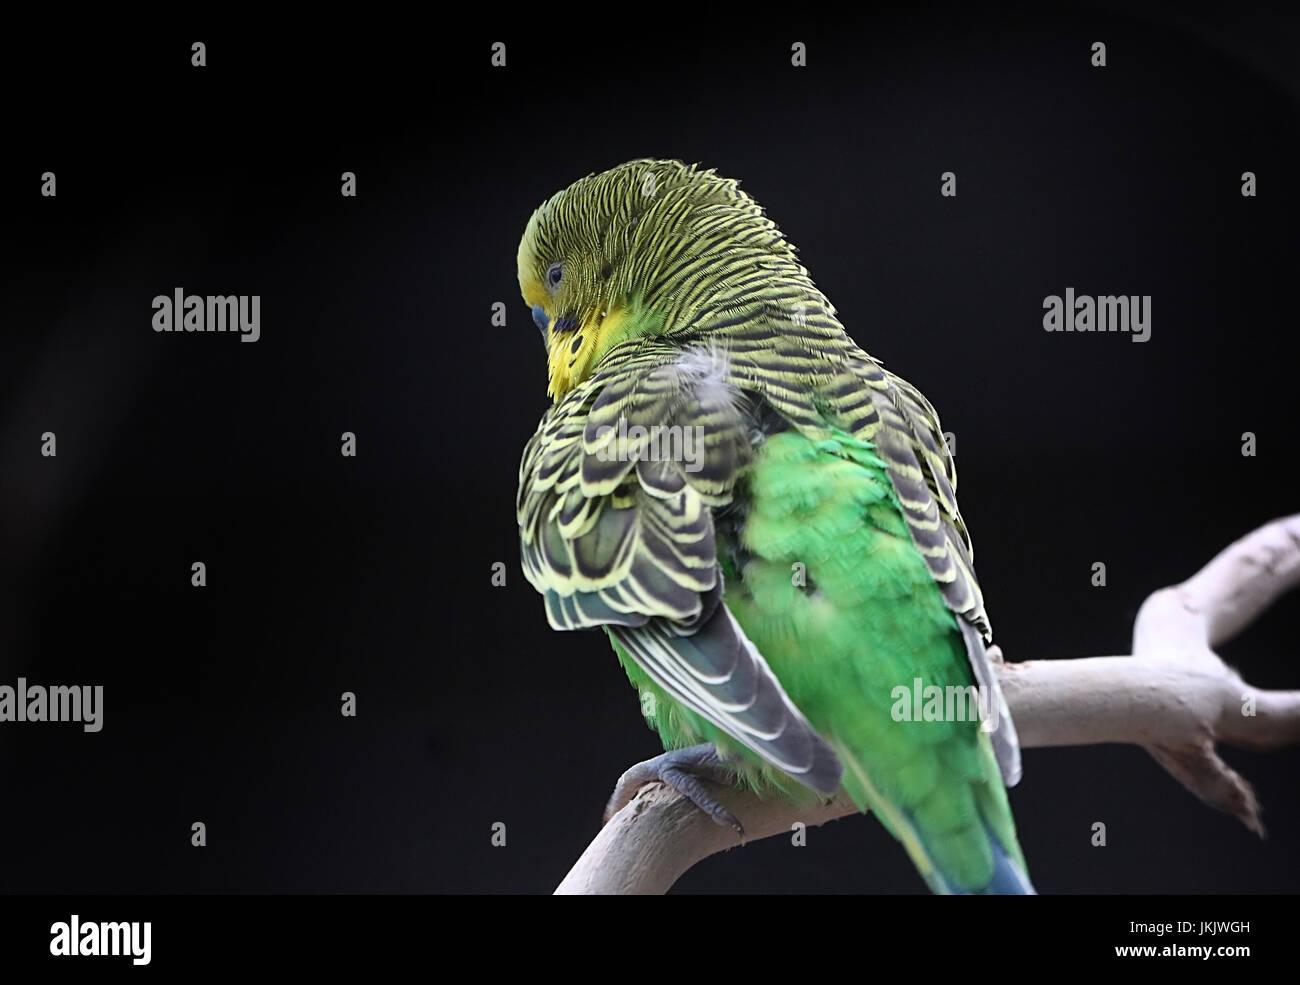 Australian Budgerigar Parakeet (Melopsittacus undulatus) in closeup. - Stock Image